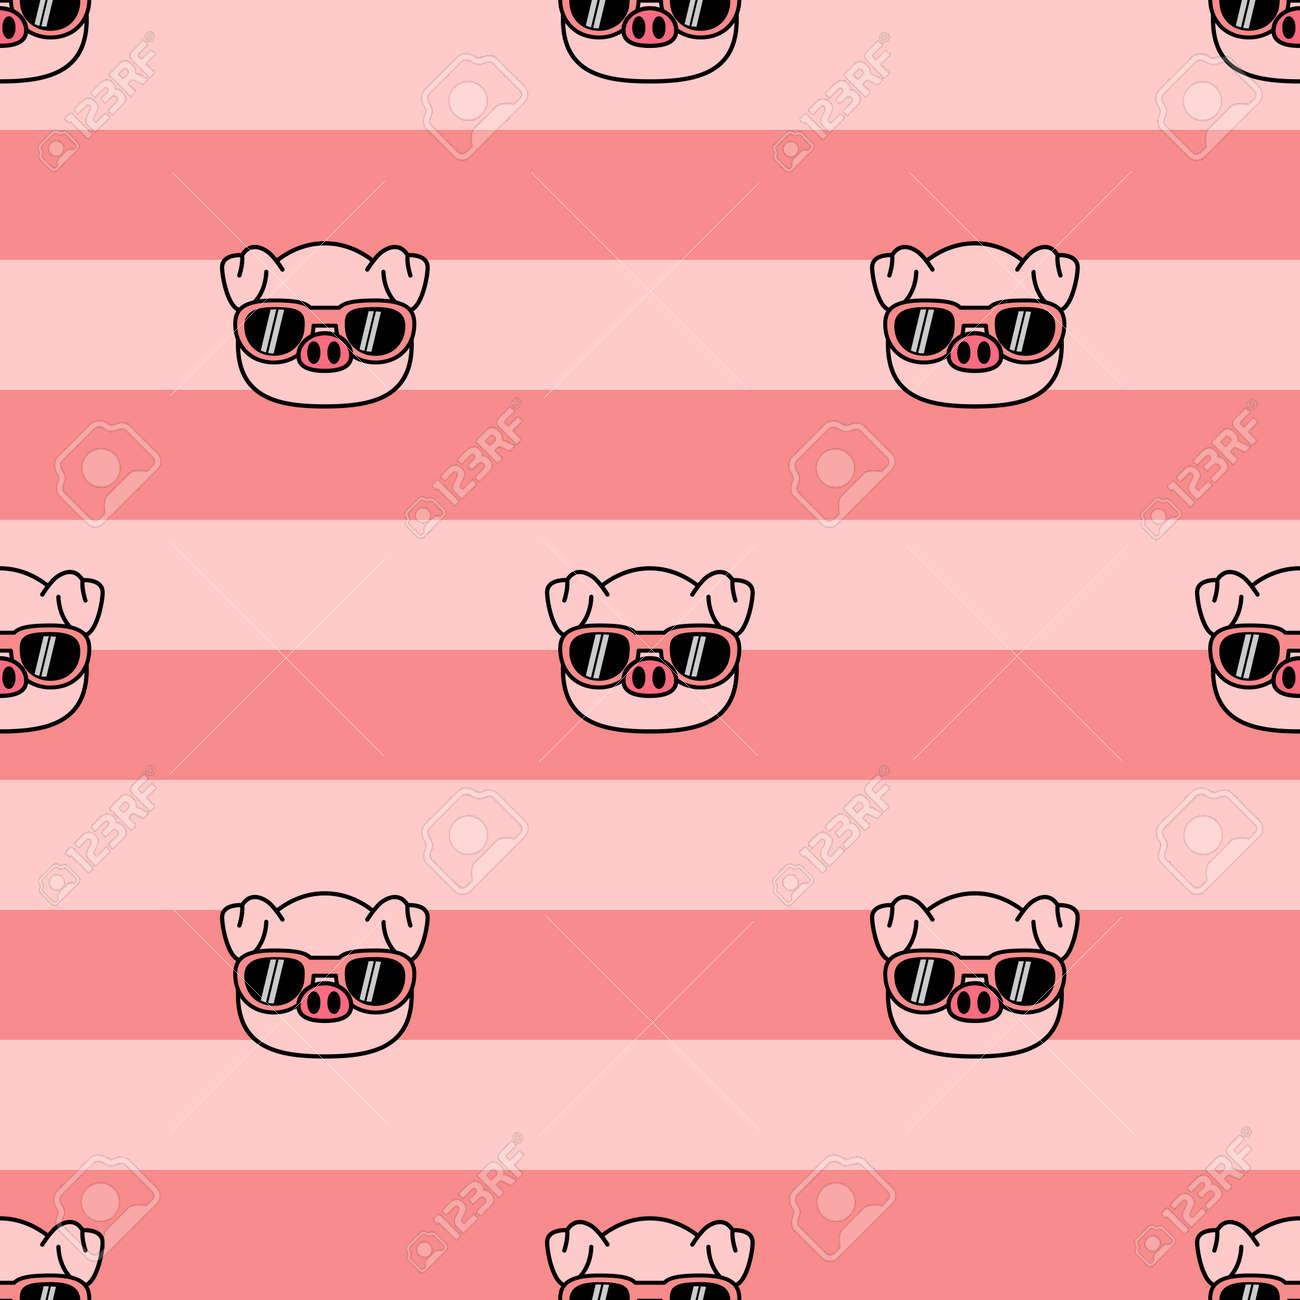 Cute pig with sunglasses cartoon seamless pattern, vector illustration - 164045076